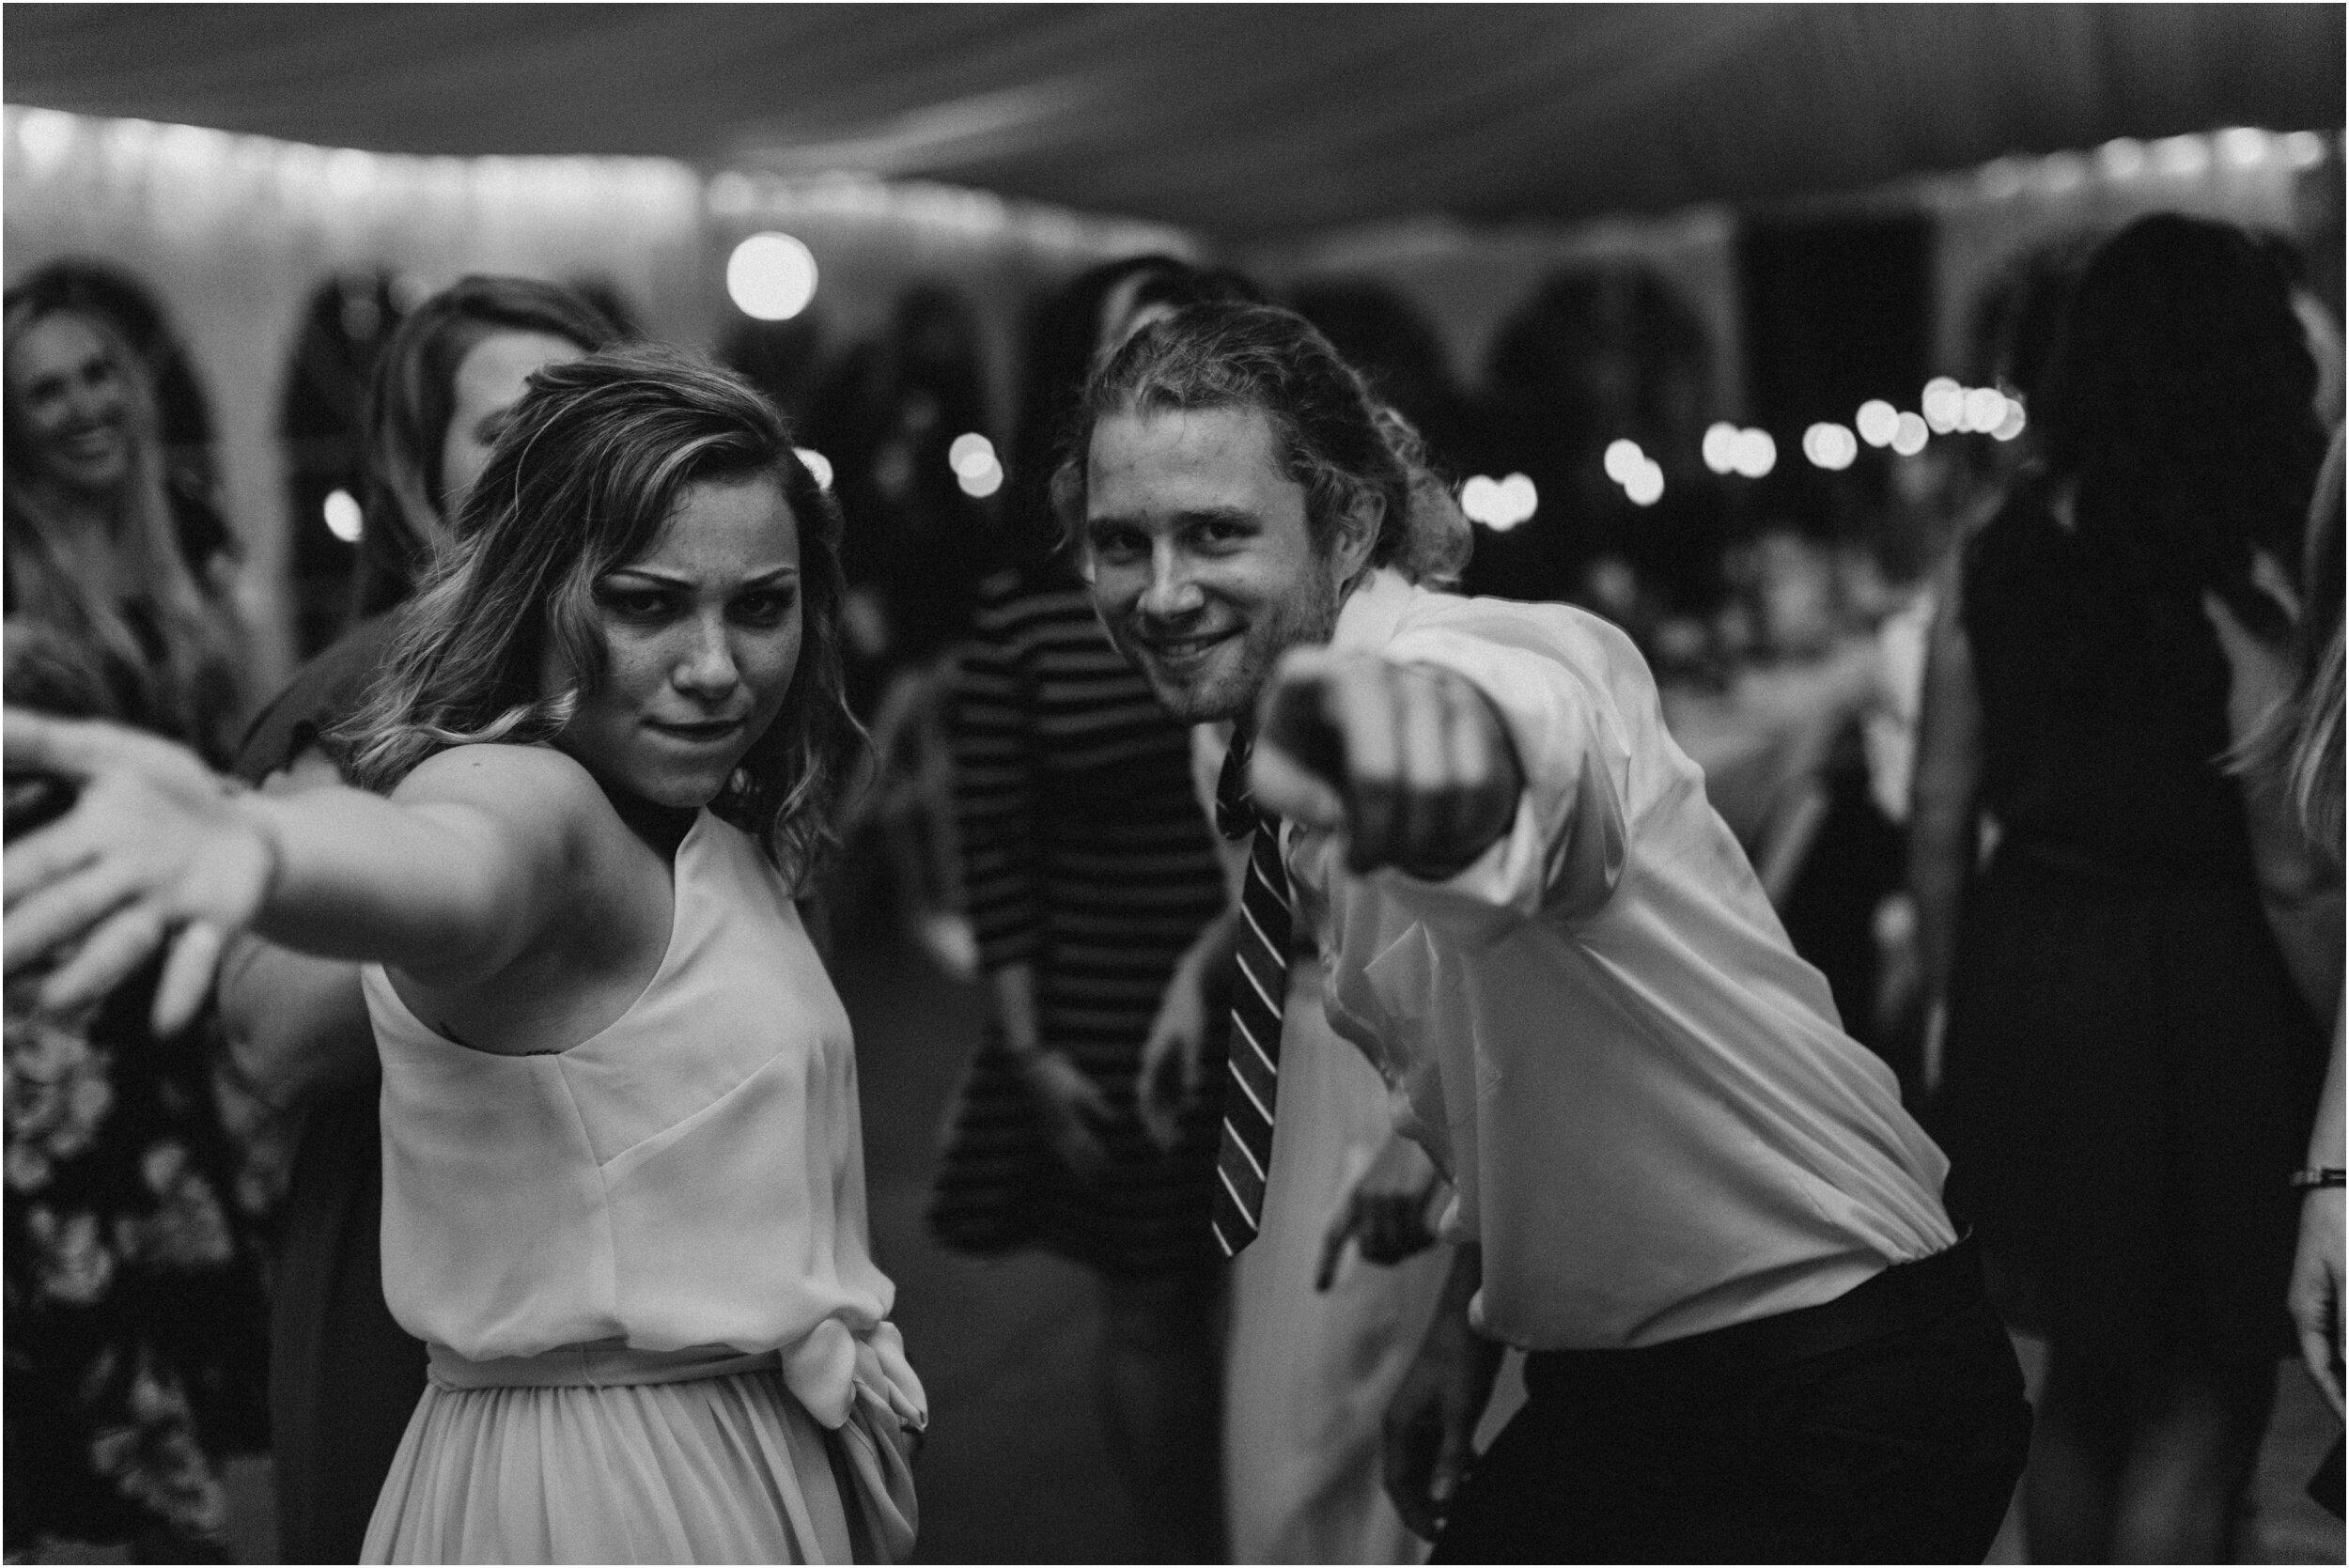 steph-and-jordan-cox-our-wedding-historic-shady-lane-compass-wedding-collective-hazel-lining-photography-destination-elopement-wedding-engagement-photography_0091.jpg